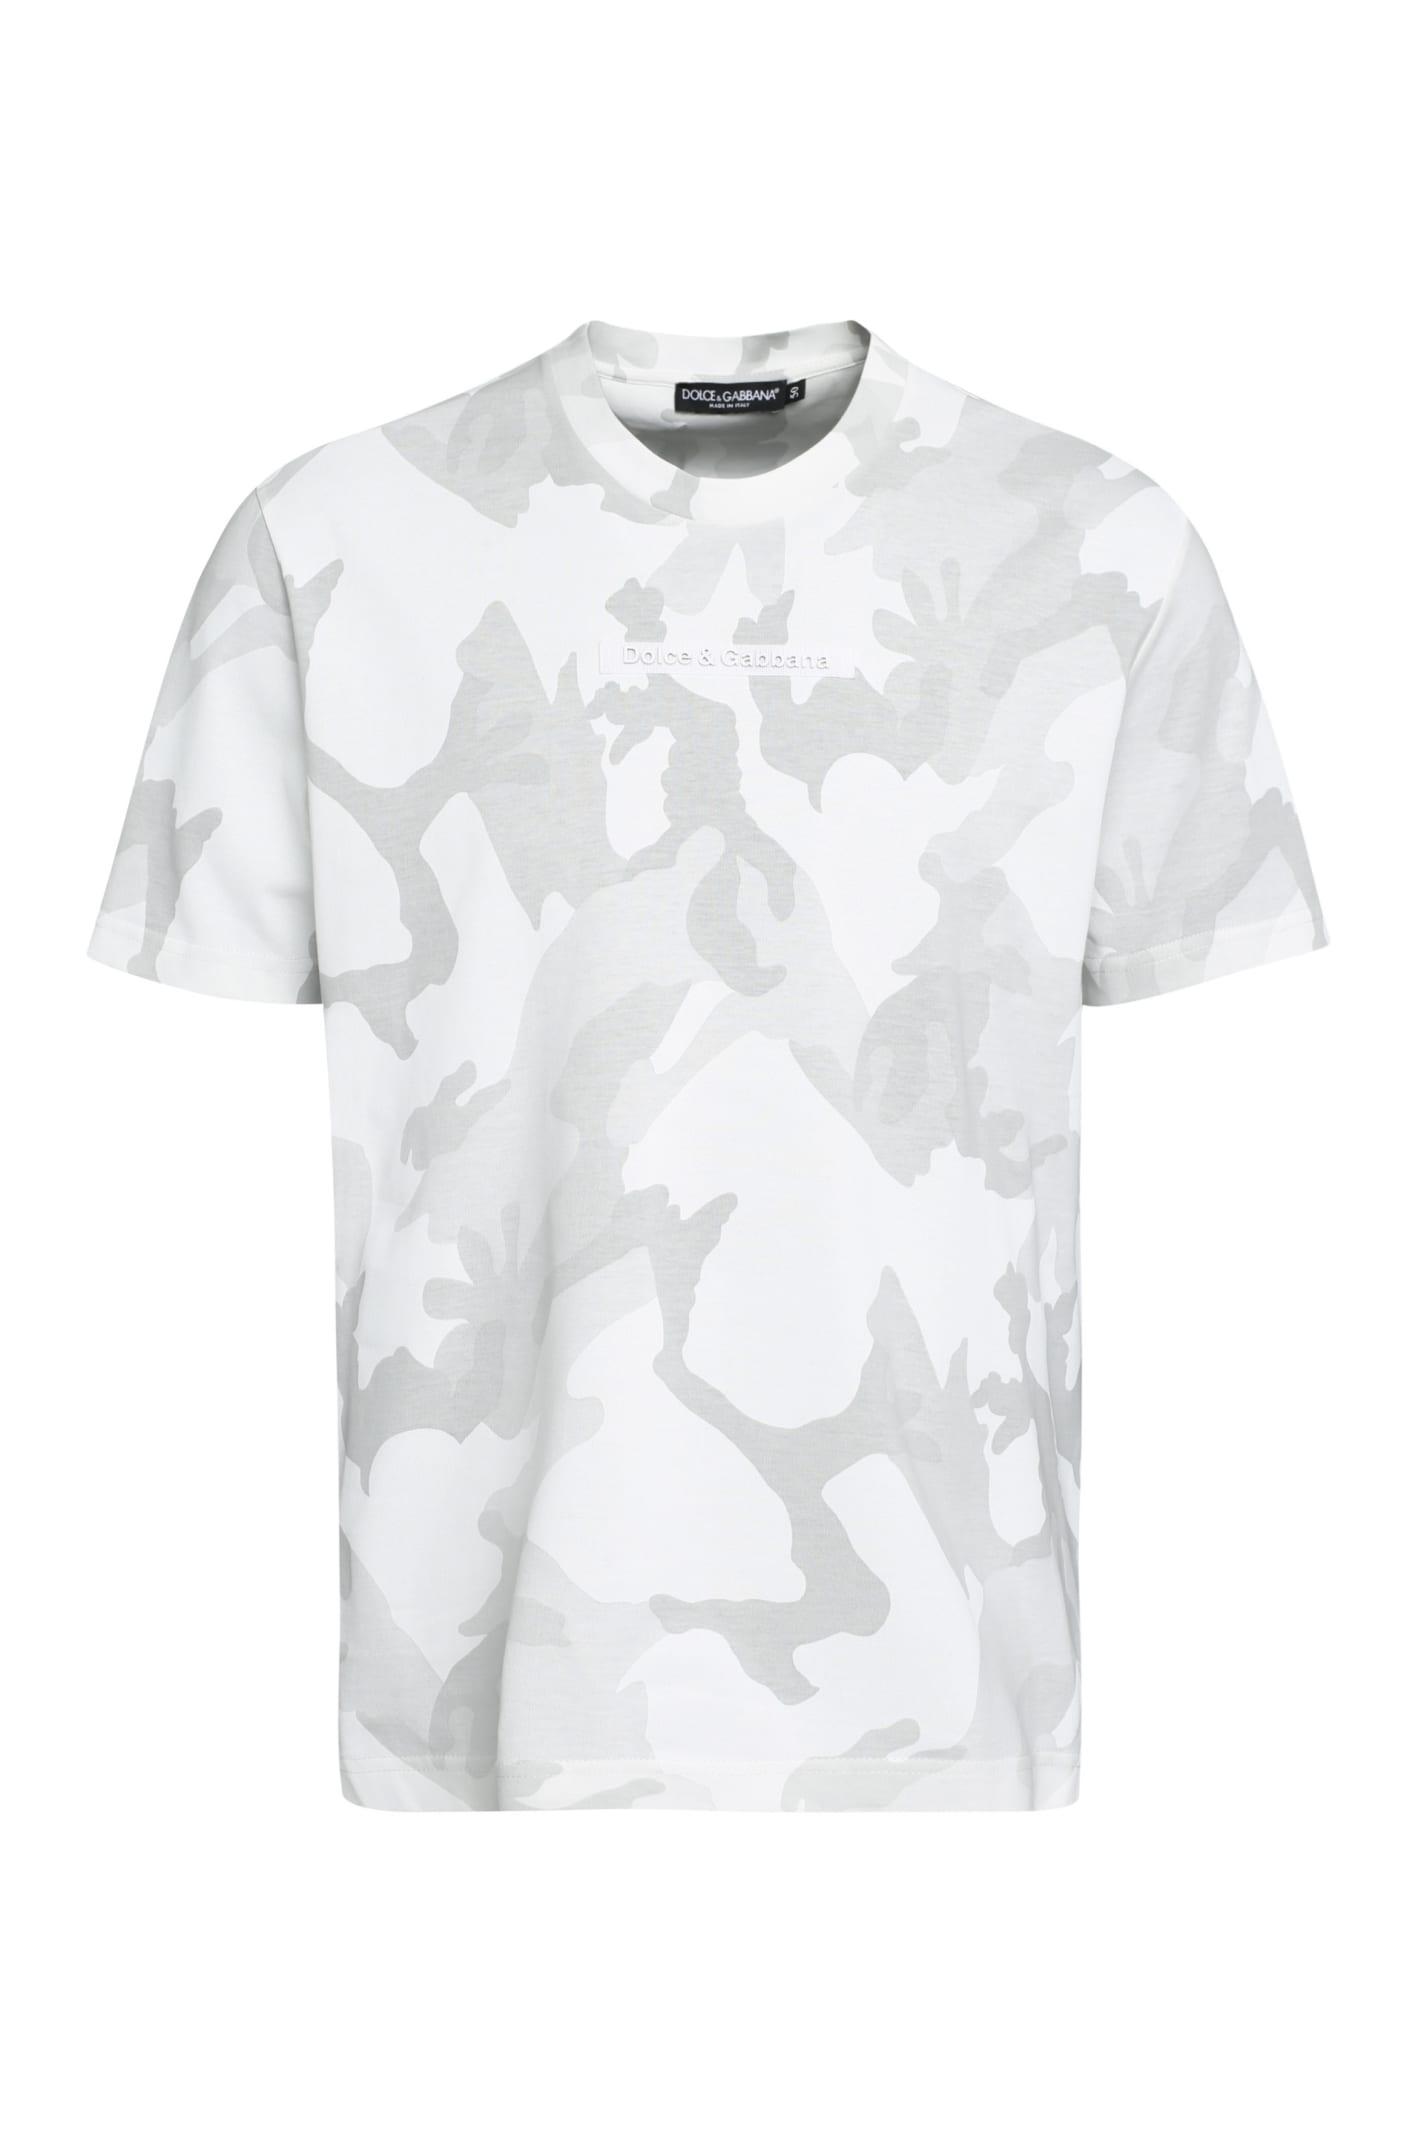 Dolce & Gabbana T-shirts COTTON CREW-NECK T-SHIRT